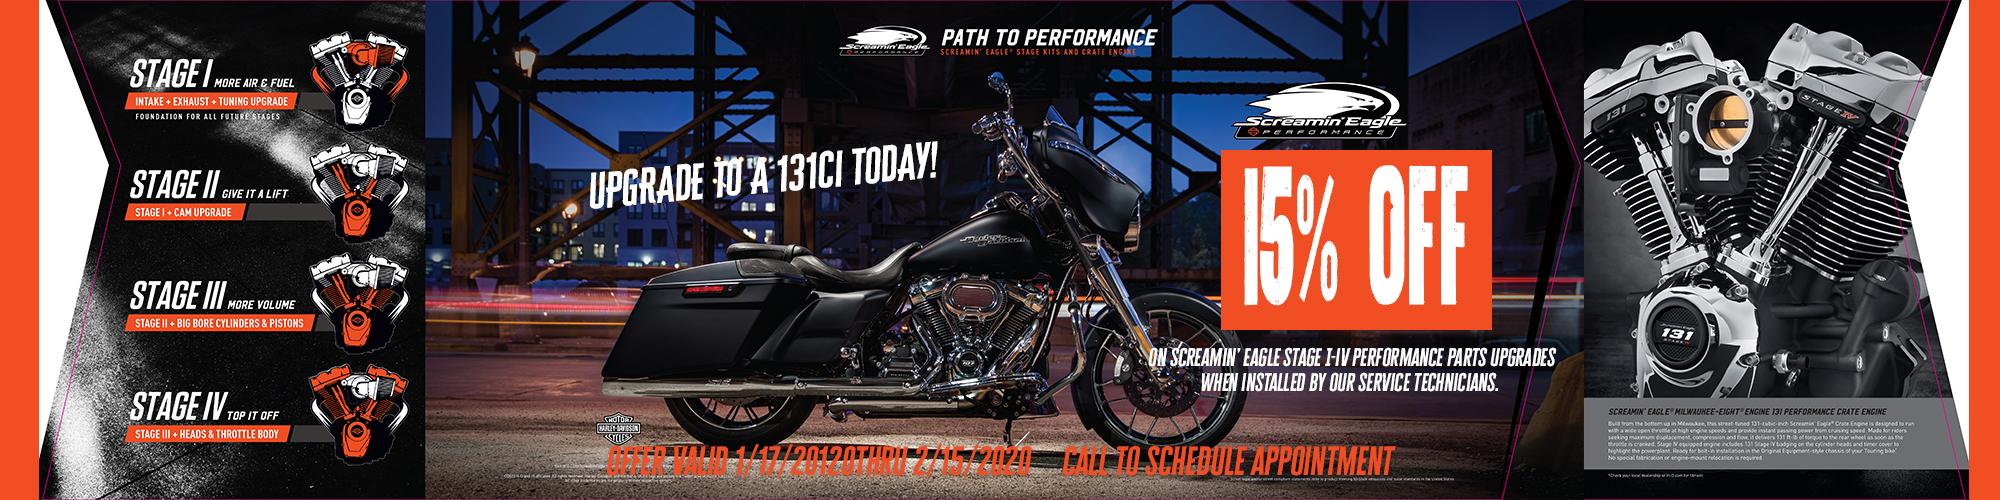 Ventura Harley-Davidson Service Department